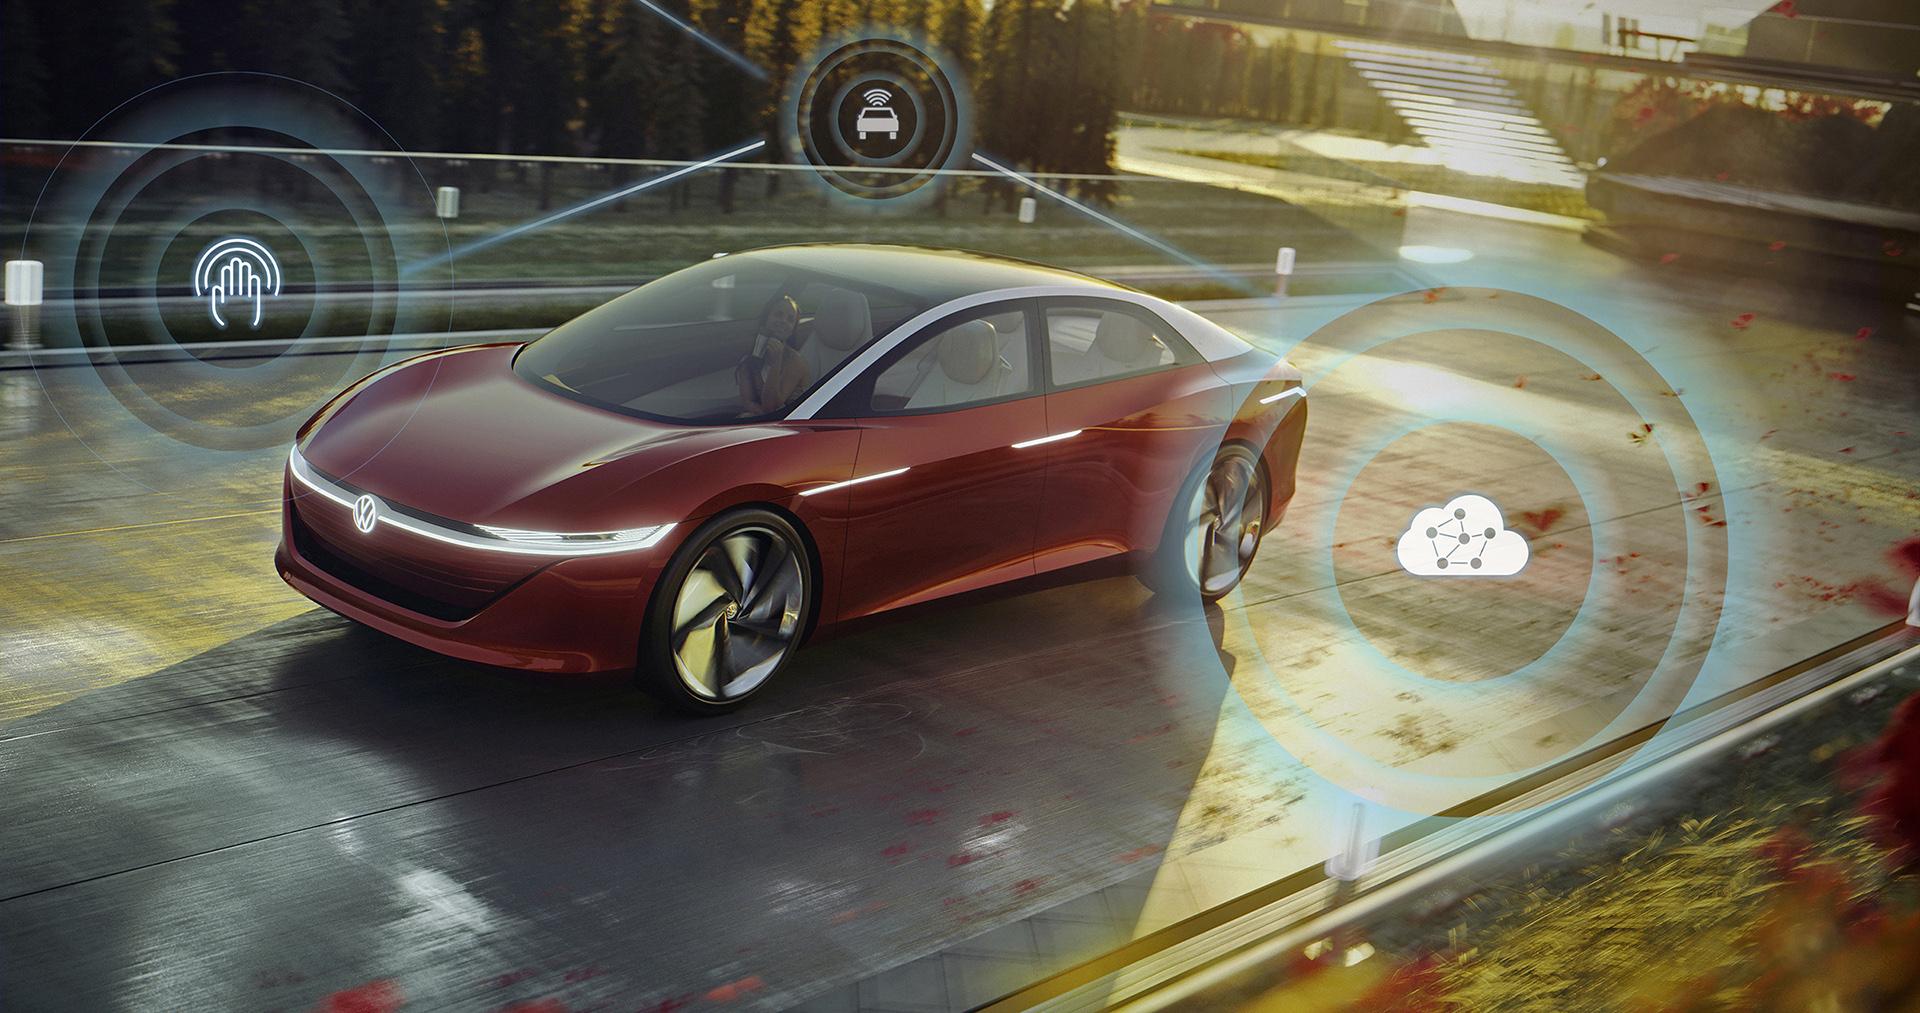 "VOLKSWAGEN INNOVATION TALK ID.VIZZION 1 Η Volkswagen μας αφήνει να ρίξουμε μια ""ματιά"" στο μέλλον της αυτοκίνησης Electric cars, electric vehicles, ID.3, ID.4, ID.4 GTX, Volkswagen, Volkswagen Group, Volkswagen ID.3, Volkswagen ID.4, Volkswagen ID.4 GTX, VW, VW ID.3, zblog, ειδήσεις, ηλεκτρικά, ηλεκτροκινηση, κινουμαι ηλεκτρικα, Νέα"